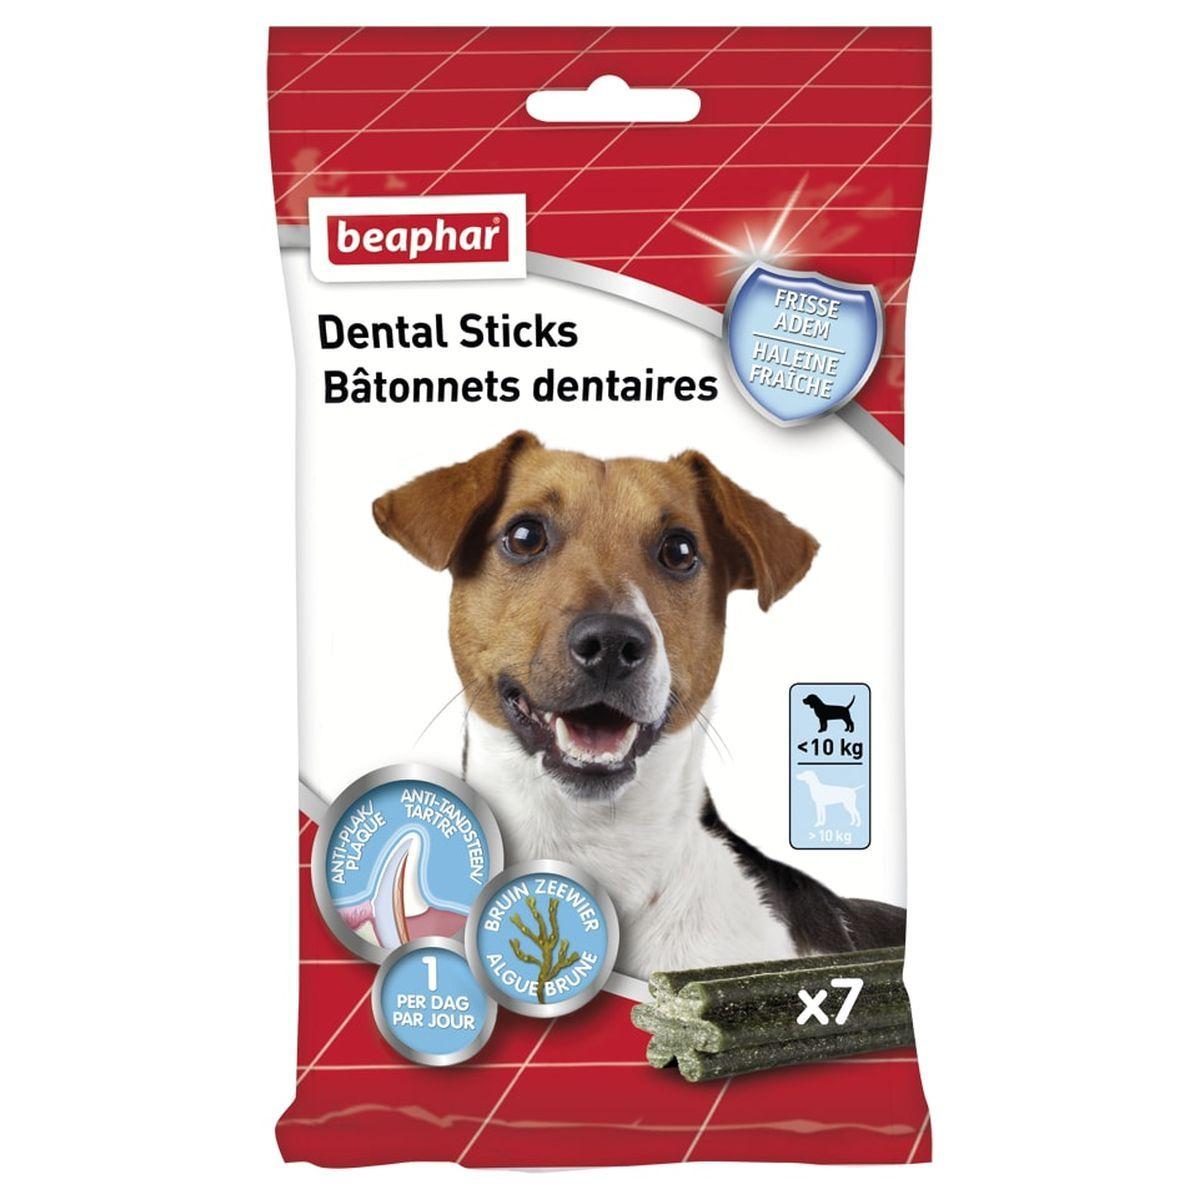 Beaphar dental sticks